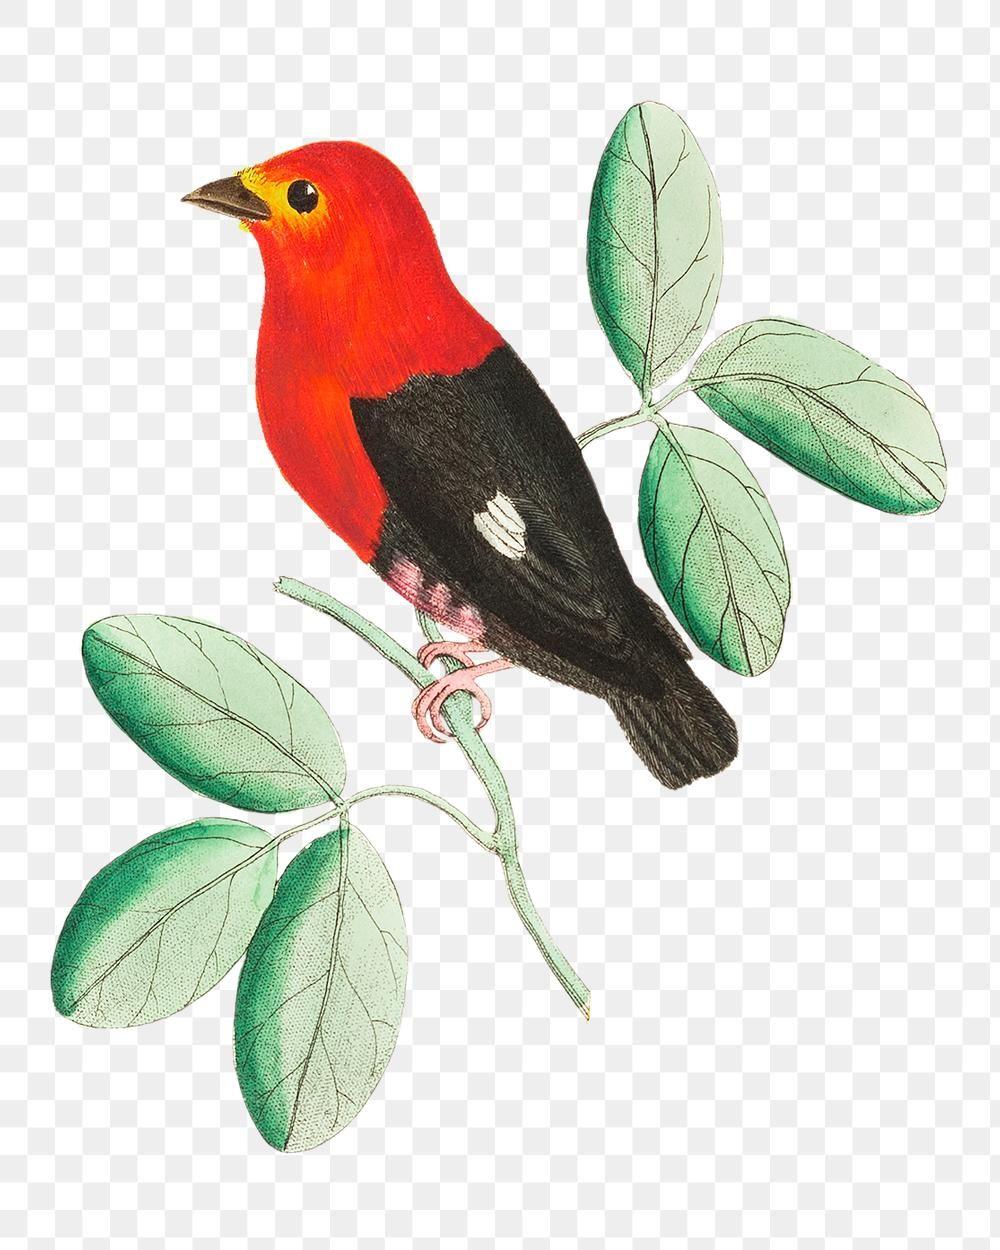 Png Animal Sticker Red Manakin Bird Illustration Free Image By Rawpixel Com Maewh Bird Illustration Animal Stickers Animal Illustration